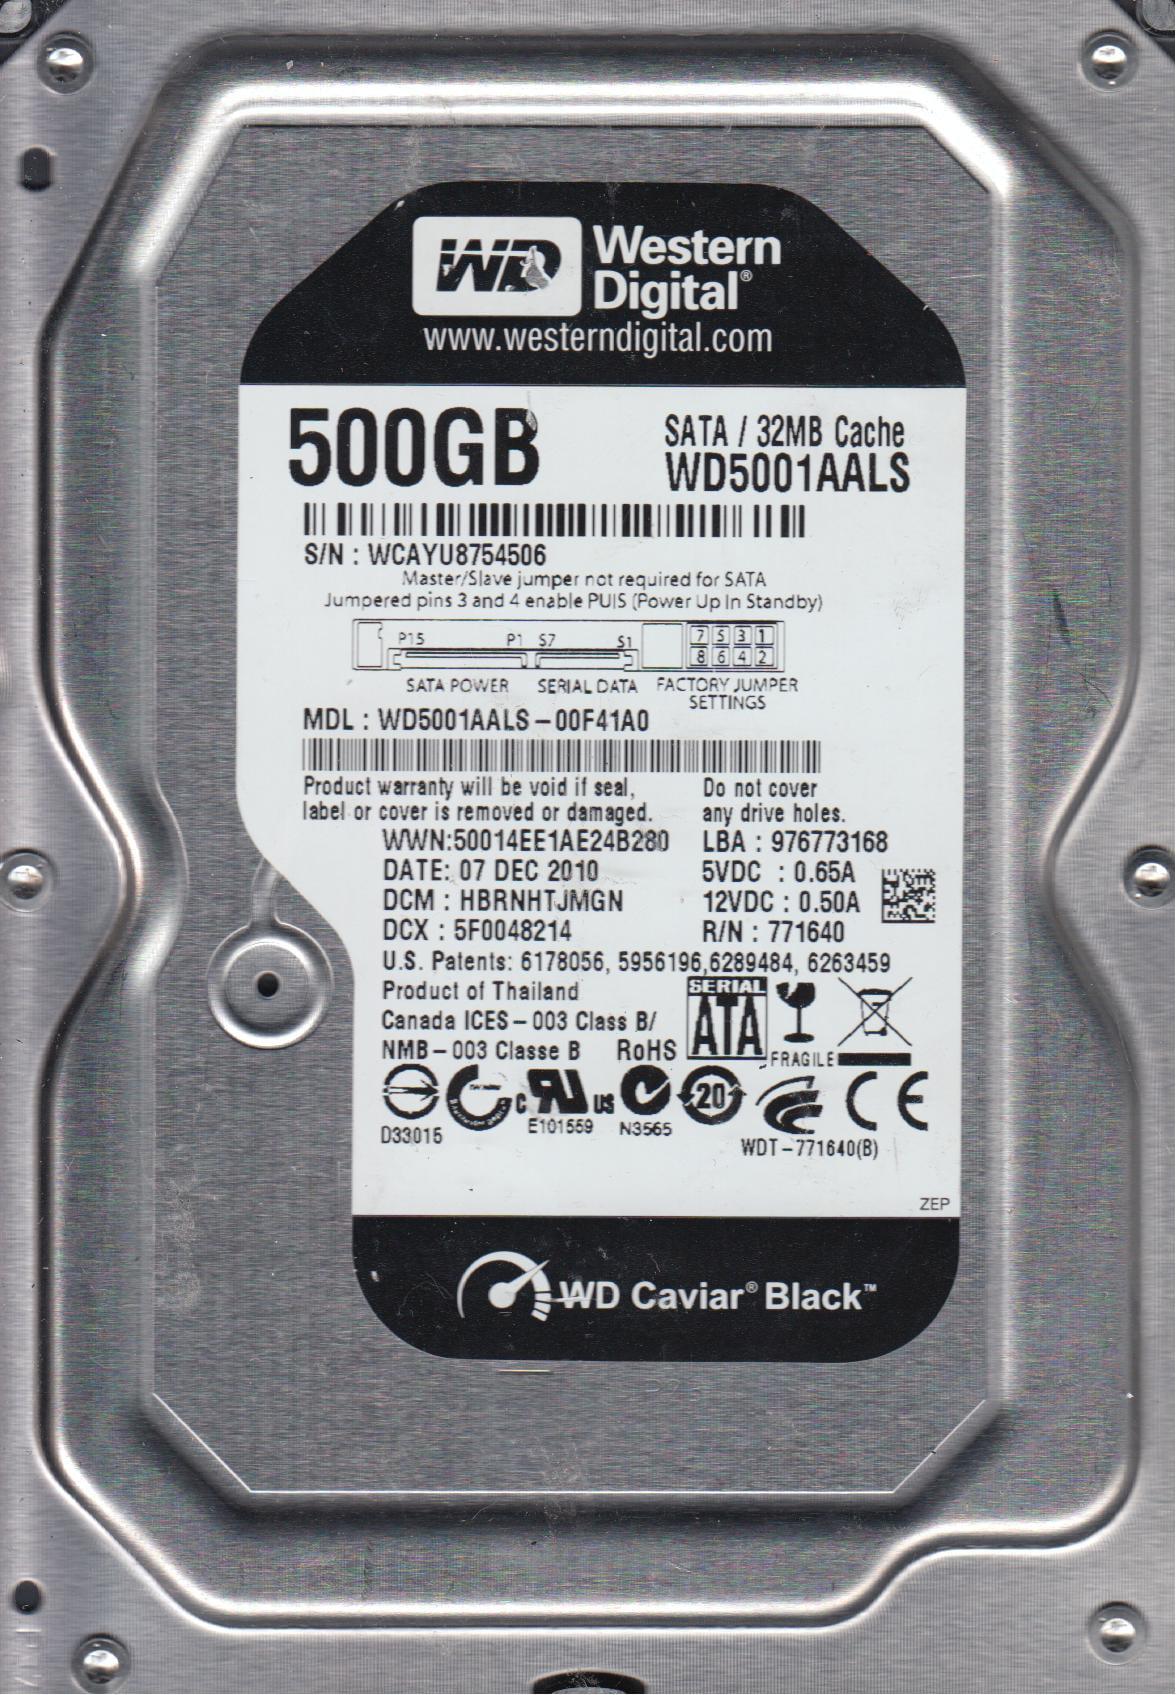 WD5001AALS-00F41A0, DCM HBRNHTJMGN, Western Digital 500GB SATA 3.5 Hard Drive by Western Digital